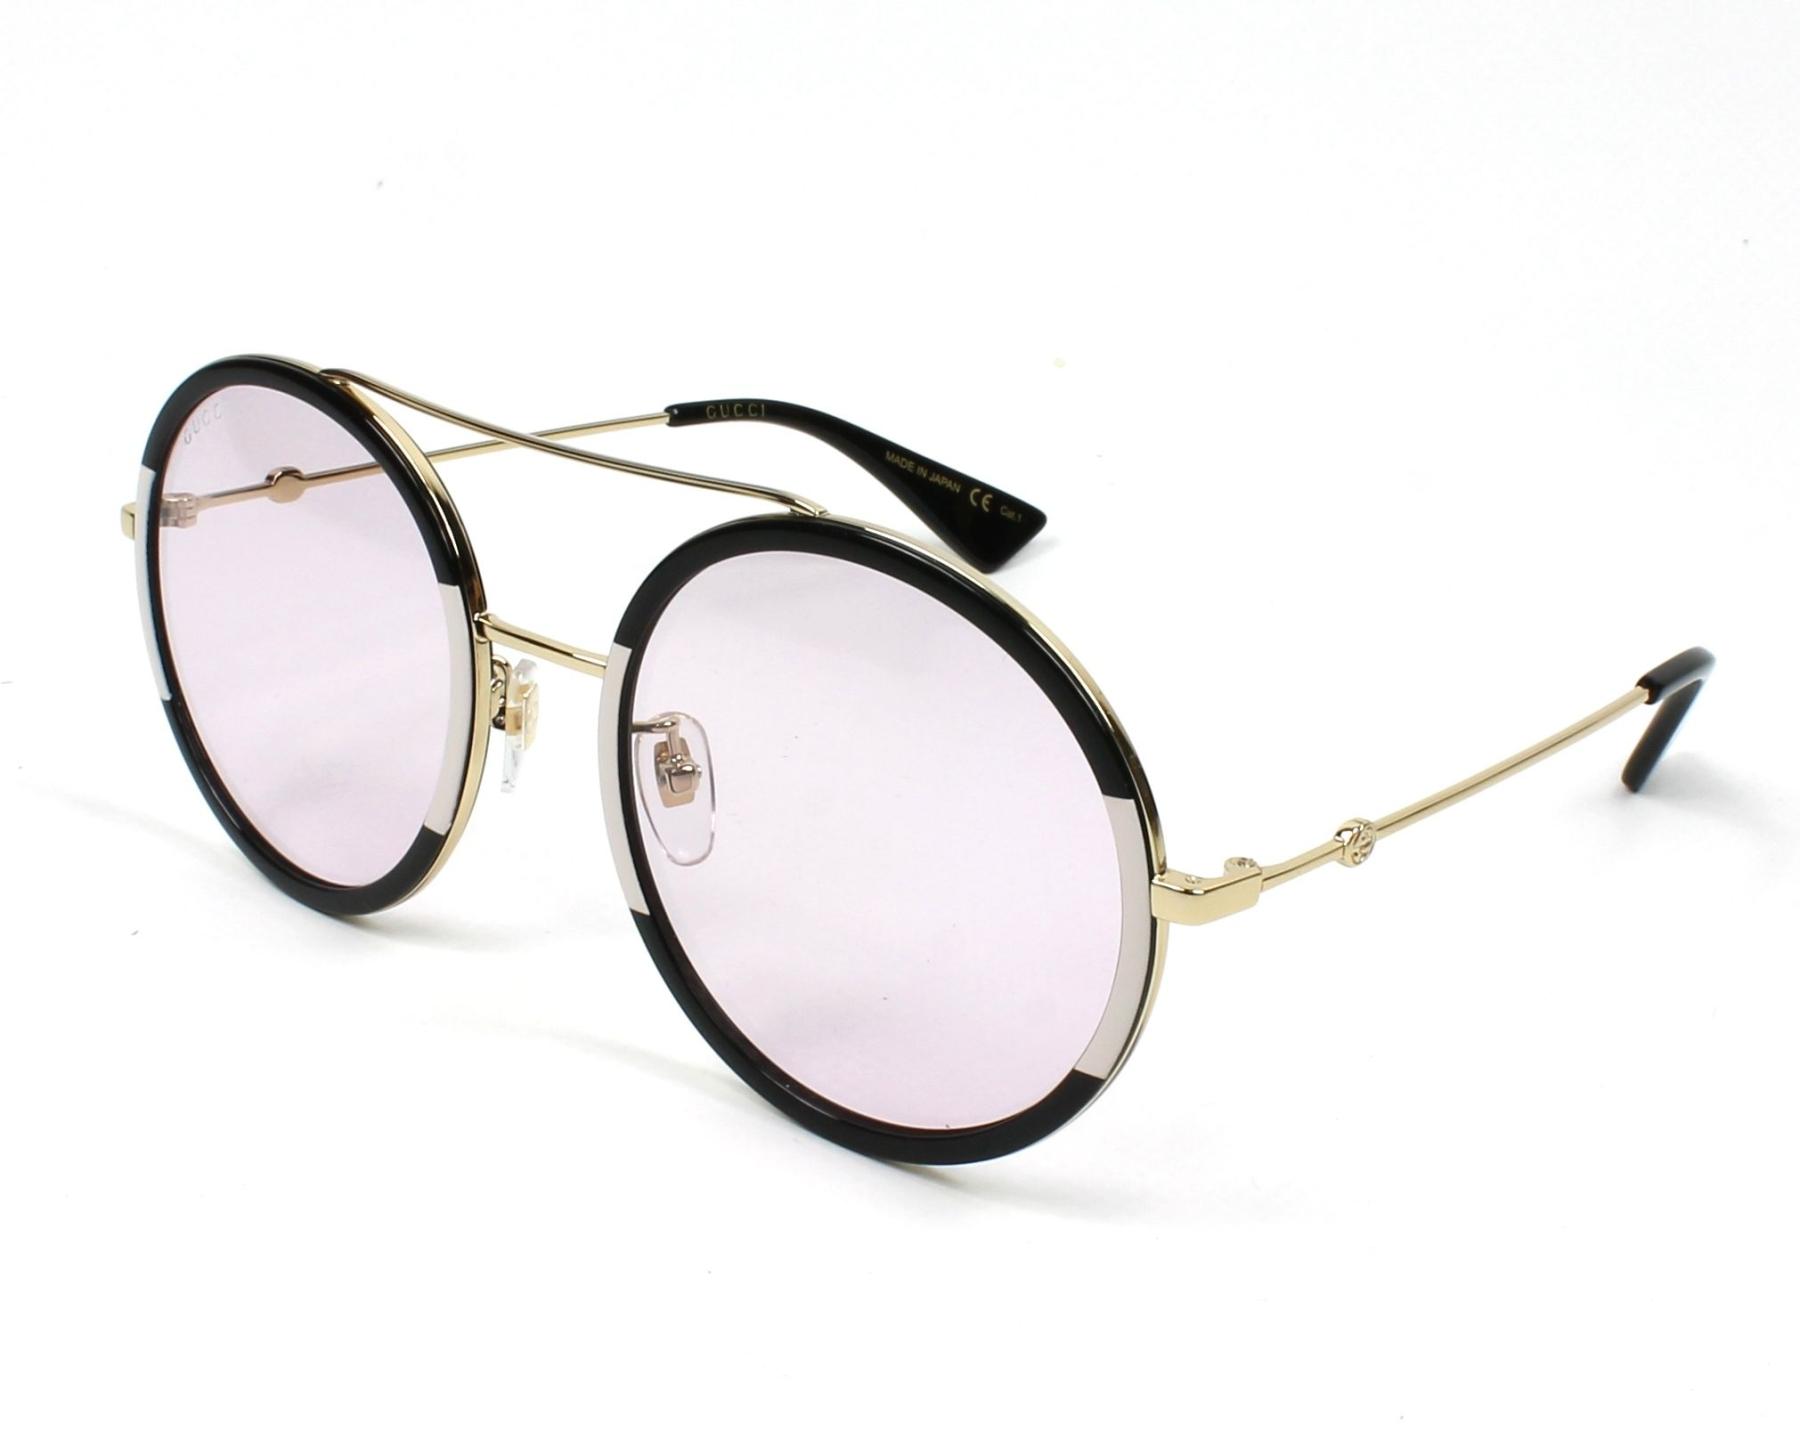 34b480b95a Gucci Sunglasses GG-0061-S 006 56-22 Black Pink